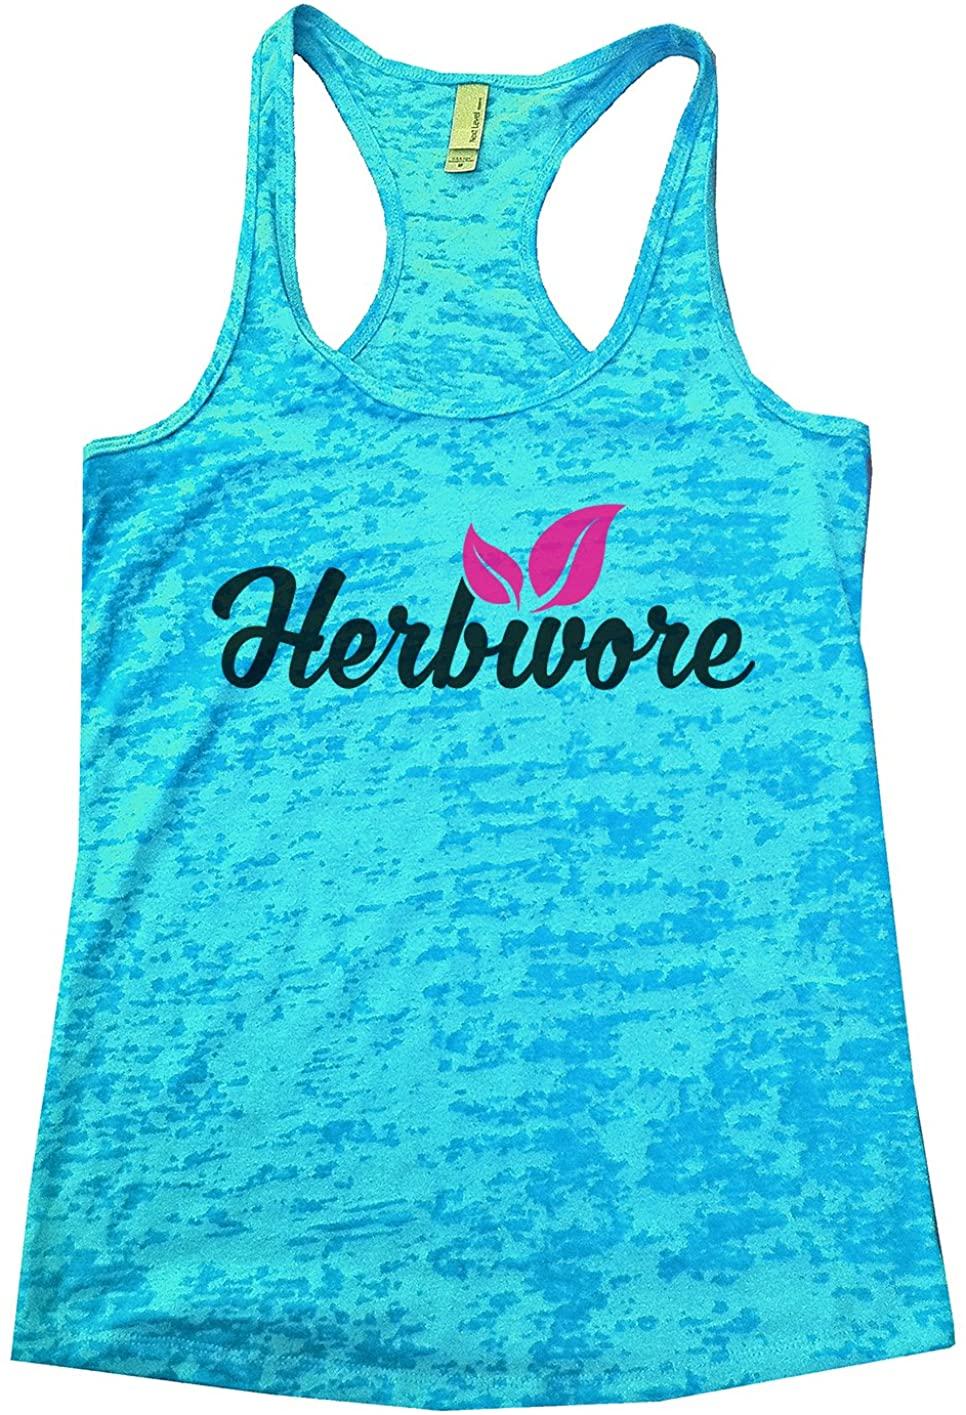 "Funny Threadz Womans Burnout Tank Top ""Herbivore"" Vegetarian Tank Top"